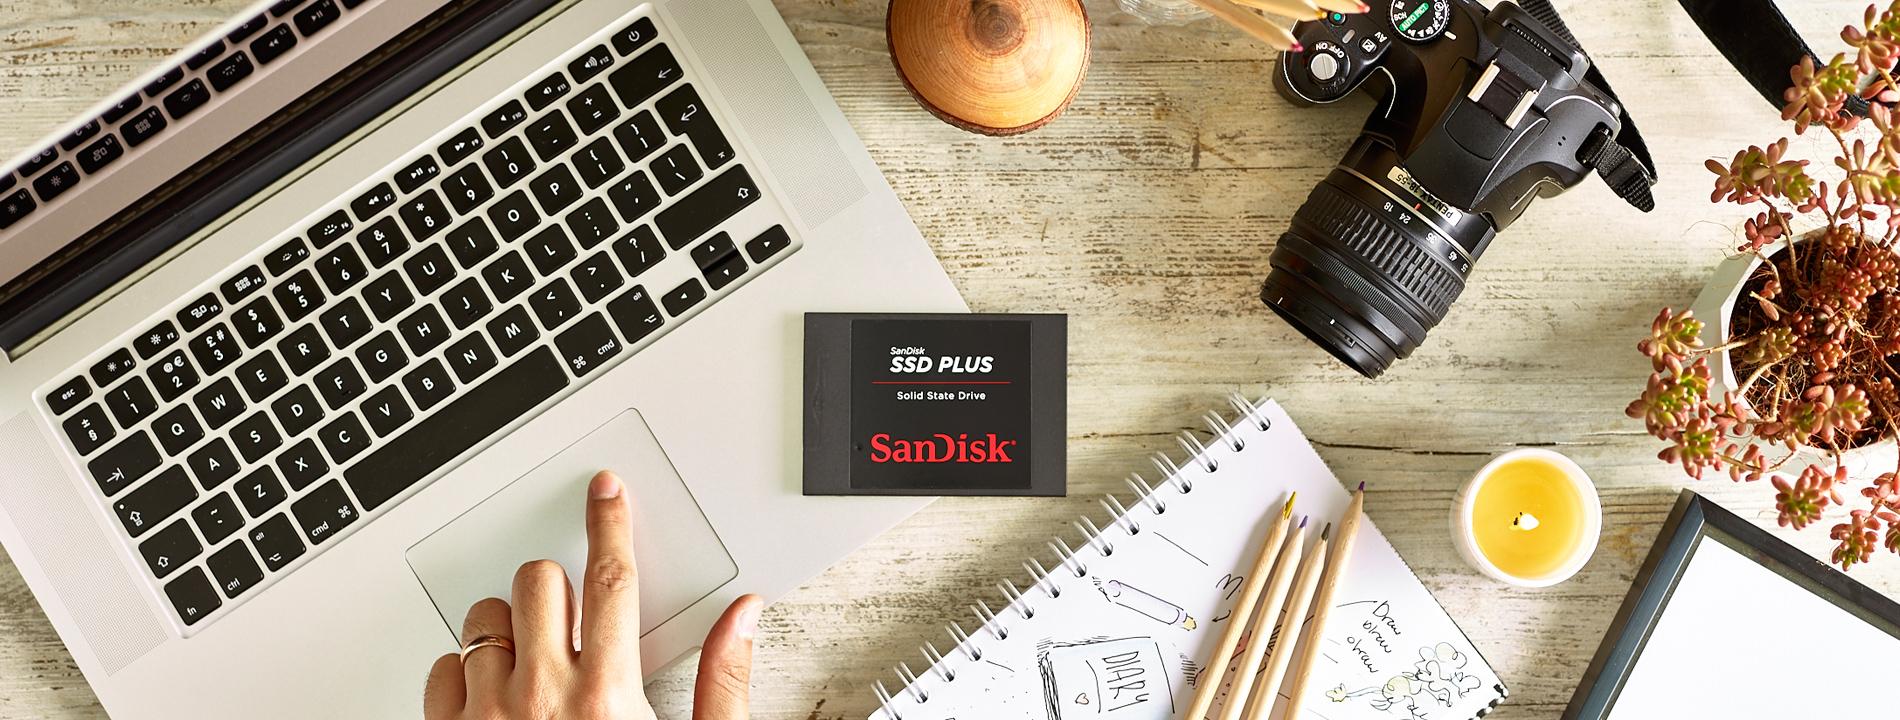 sandisk_slider